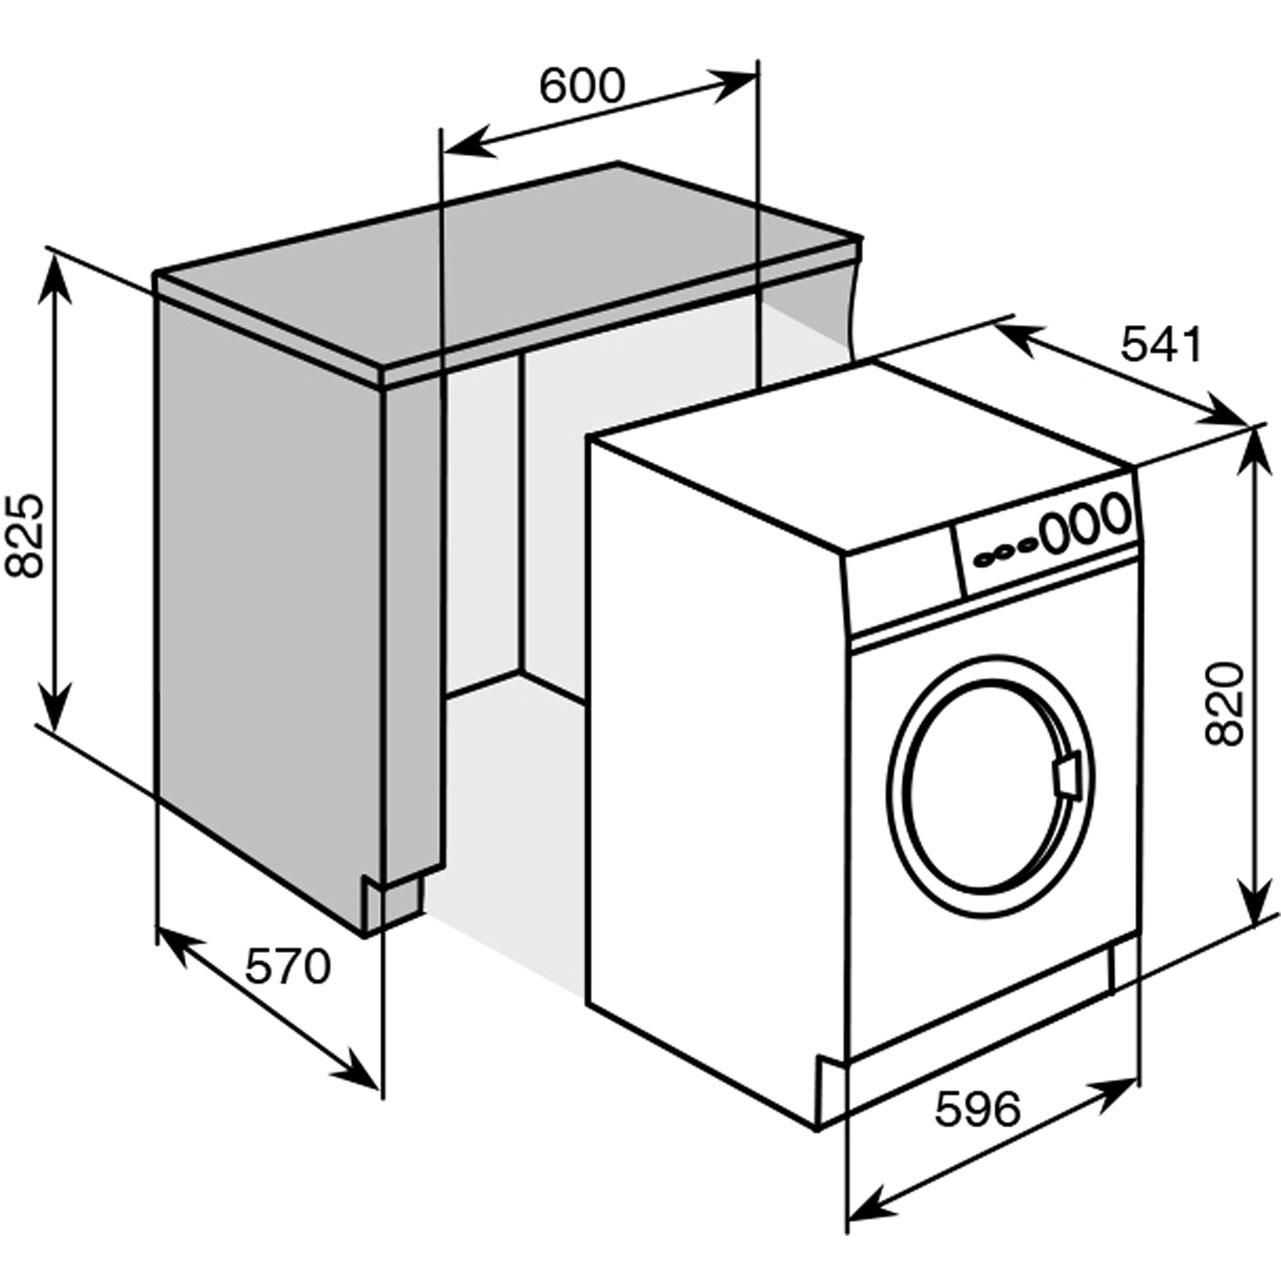 Washer Machine Electrical Diagram Within Diagram Wiring